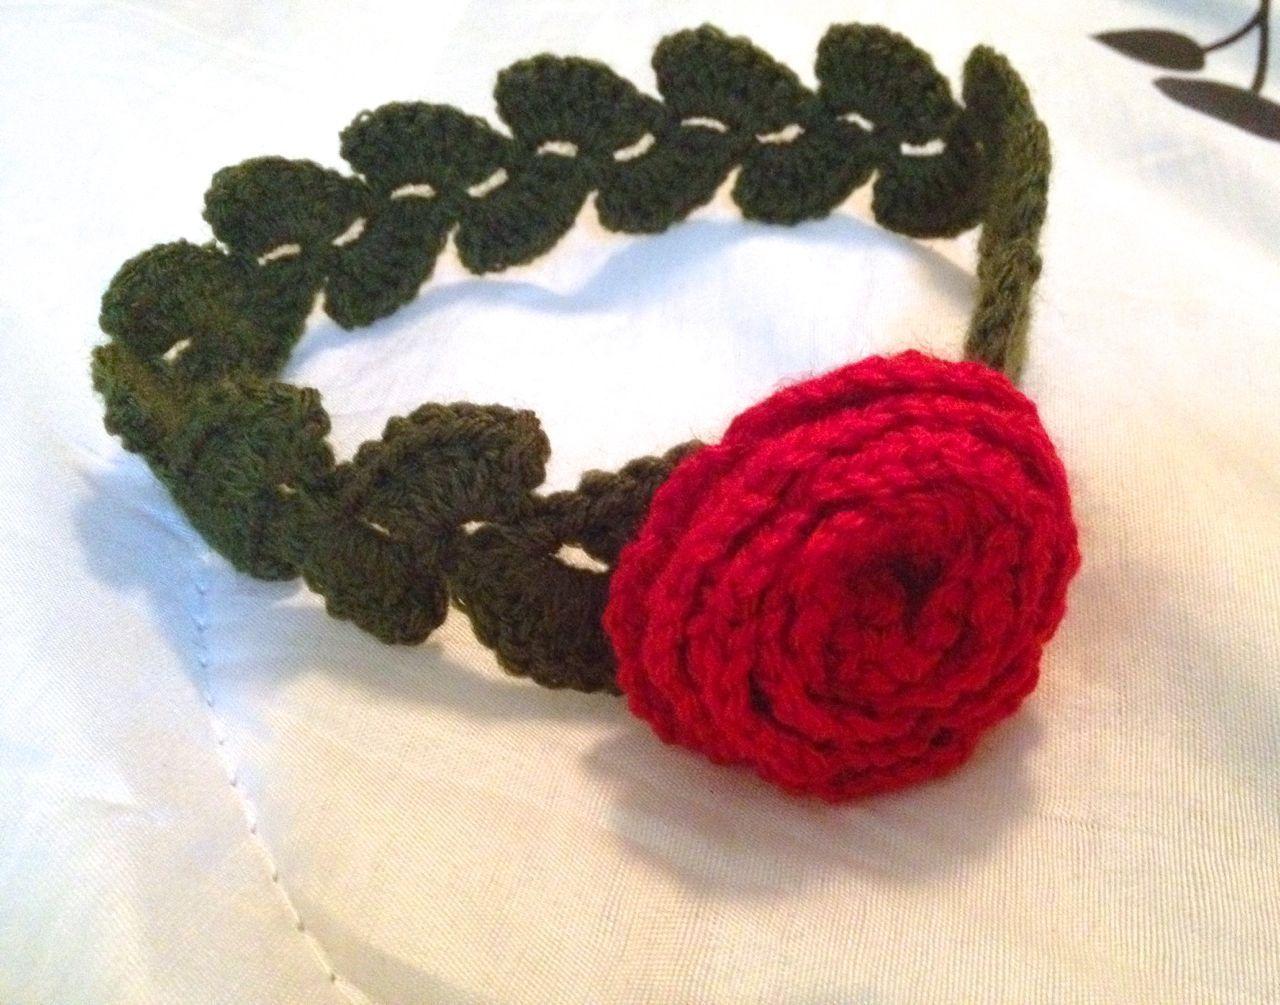 Baby Flower Headband - Baby Rose Headband - Baby Floral Headband - Photo Prop - Rose and Leaves Headband - 0-12 Months - Customizable